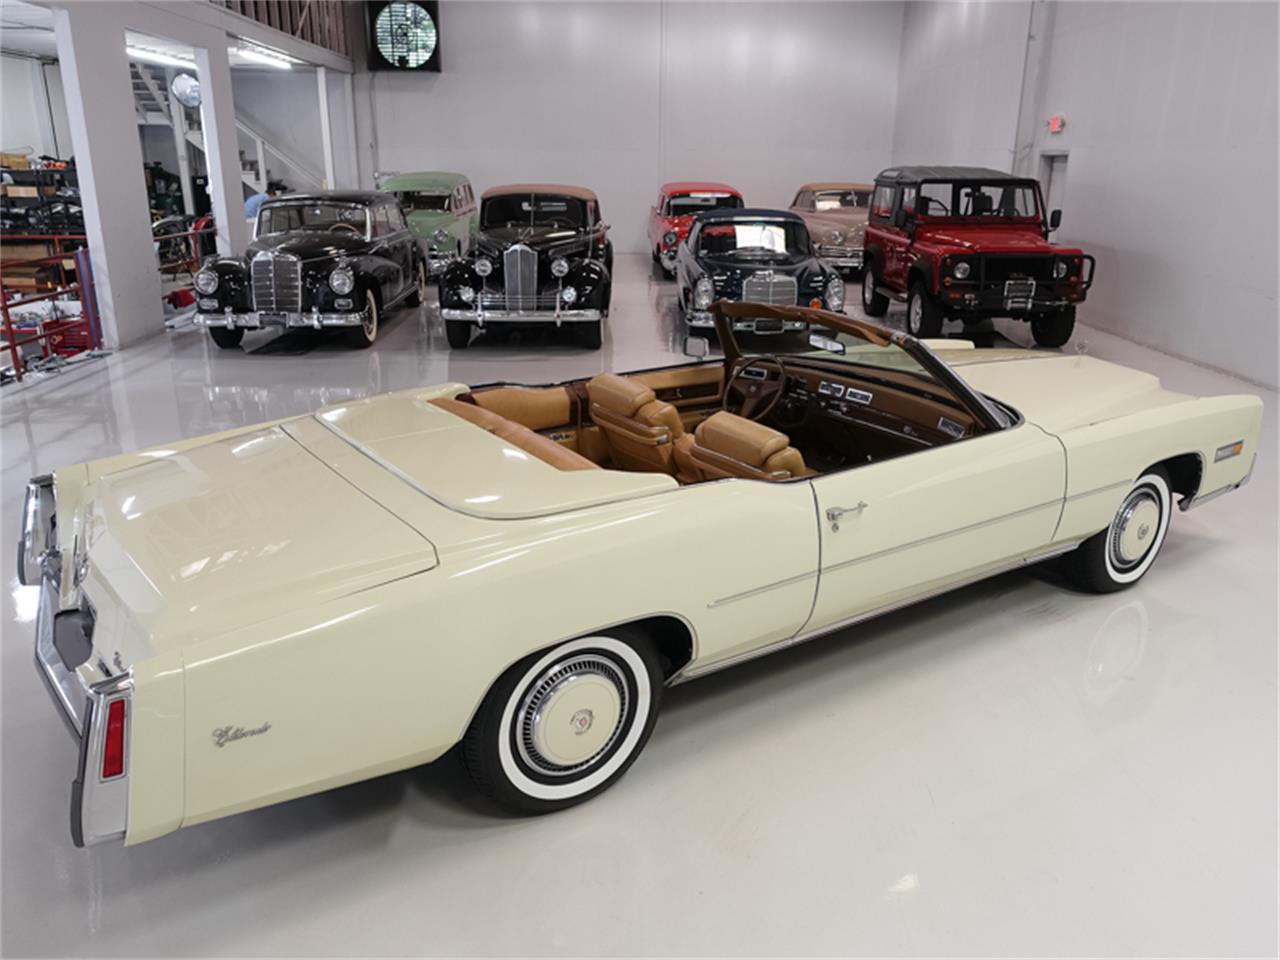 1976 Cadillac Eldorado for sale in St. Louis, MO ...